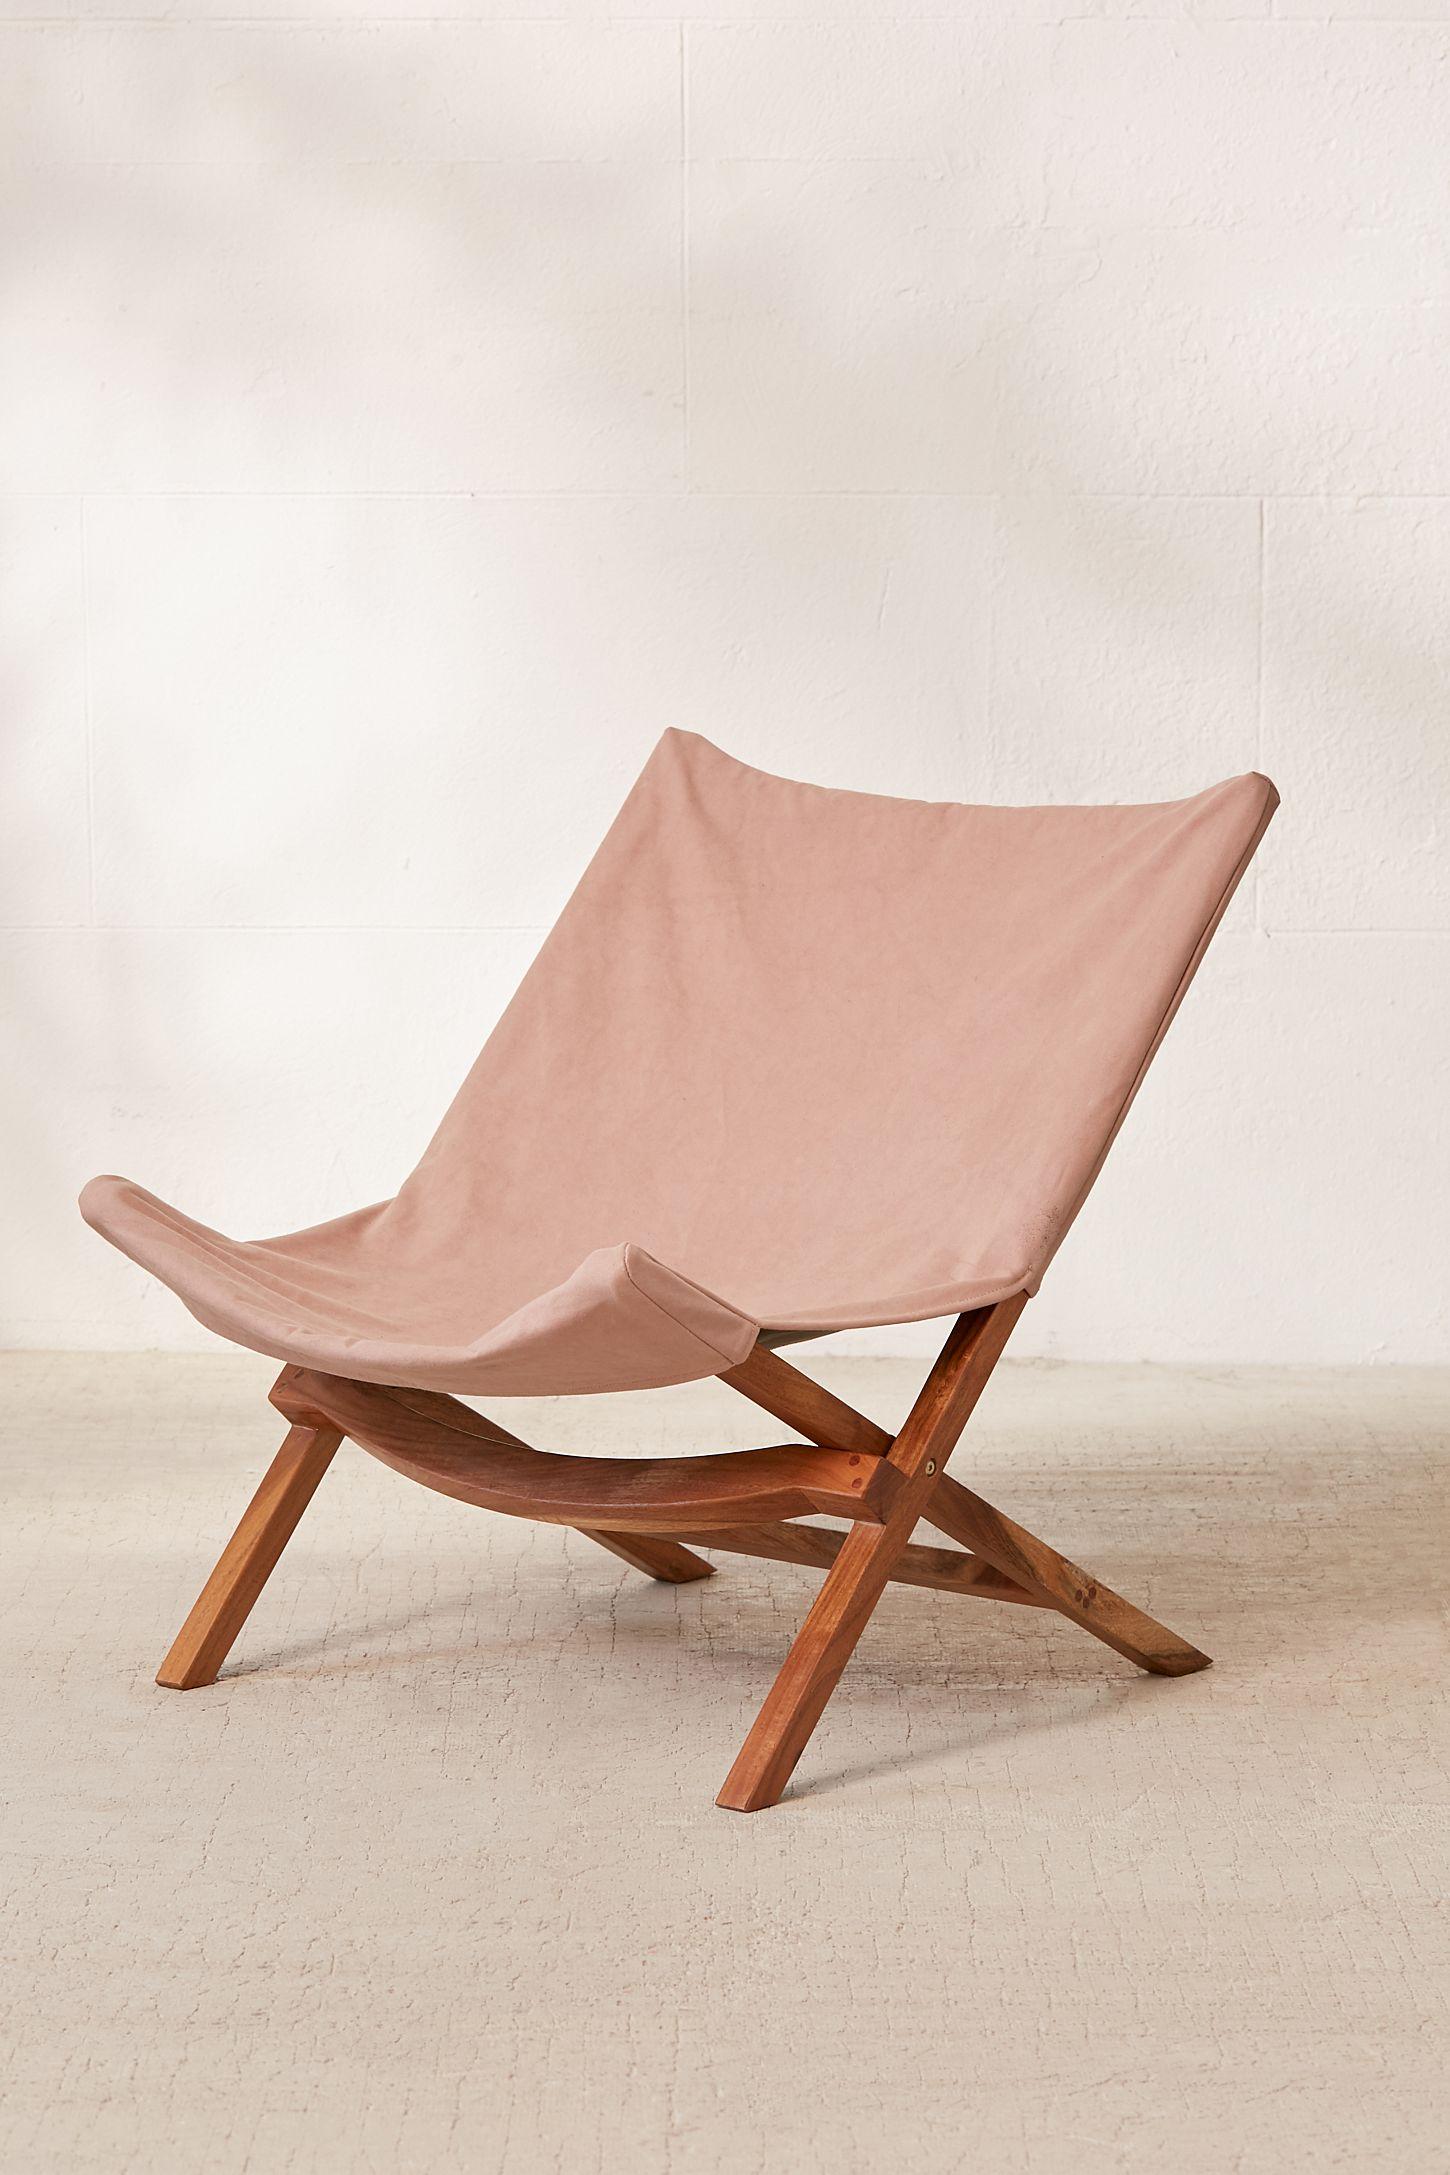 Astonishing Kumi Wooden Folding Chair Machost Co Dining Chair Design Ideas Machostcouk